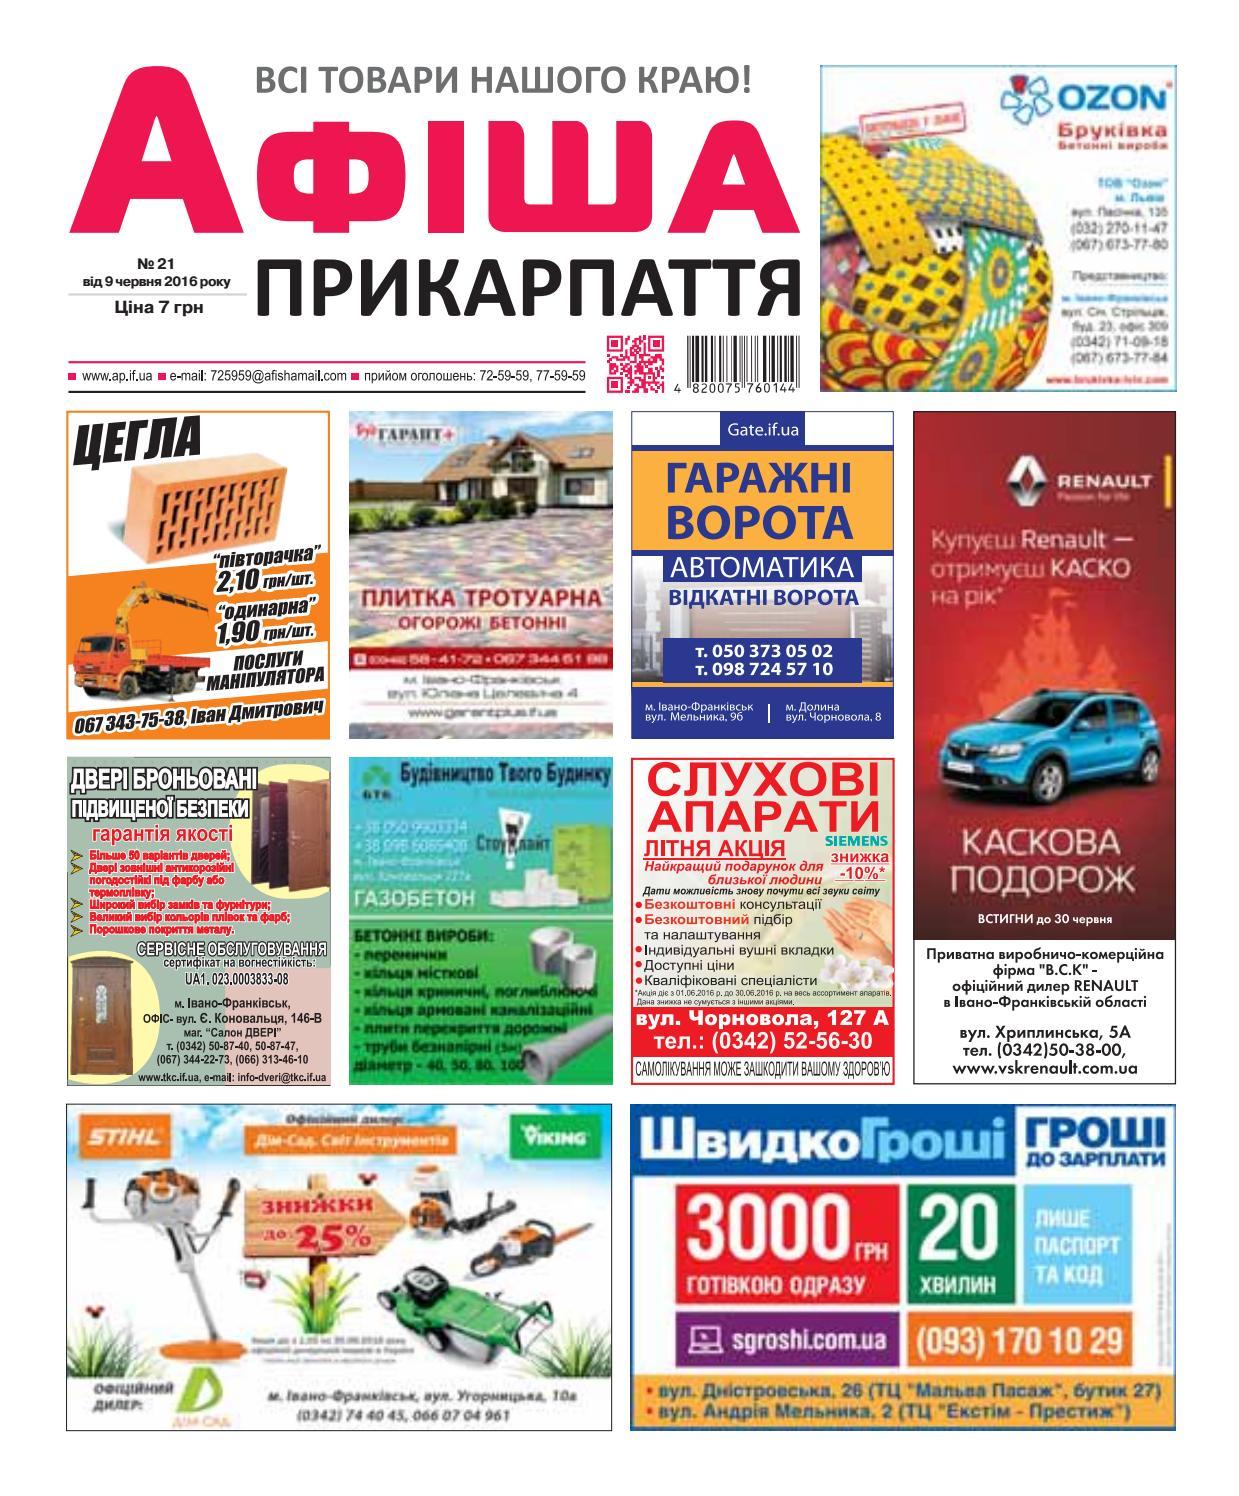 Афіша ПРИКАРПАТТЯ №21 by Olya Olya - issuu c10475e43ad80